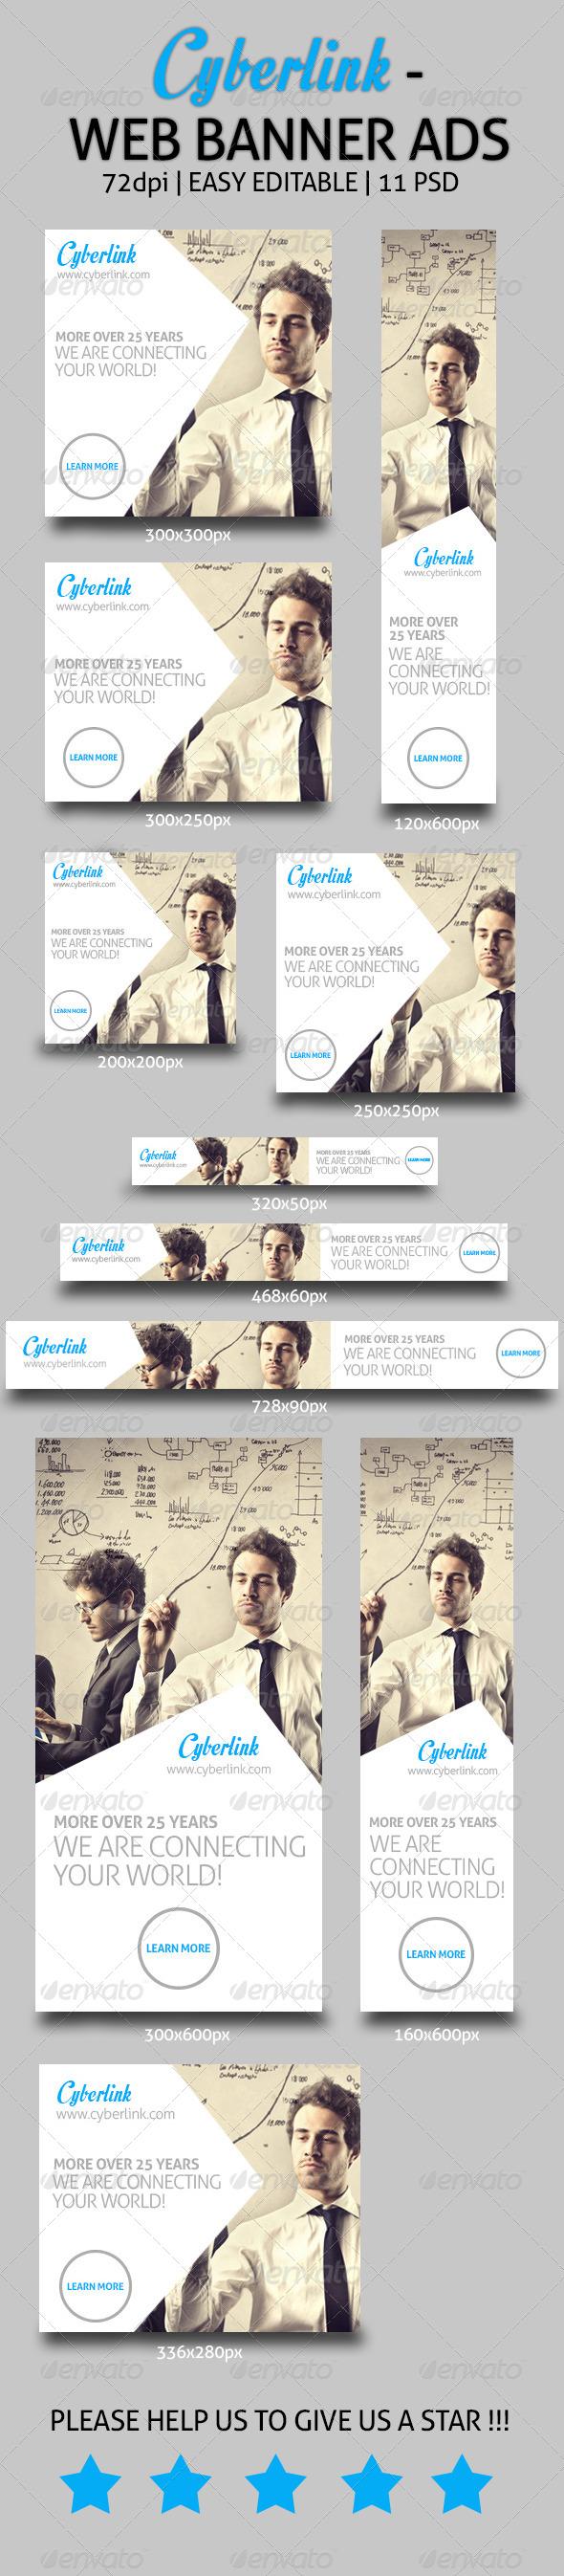 Cyberlink - Web Banner Ads